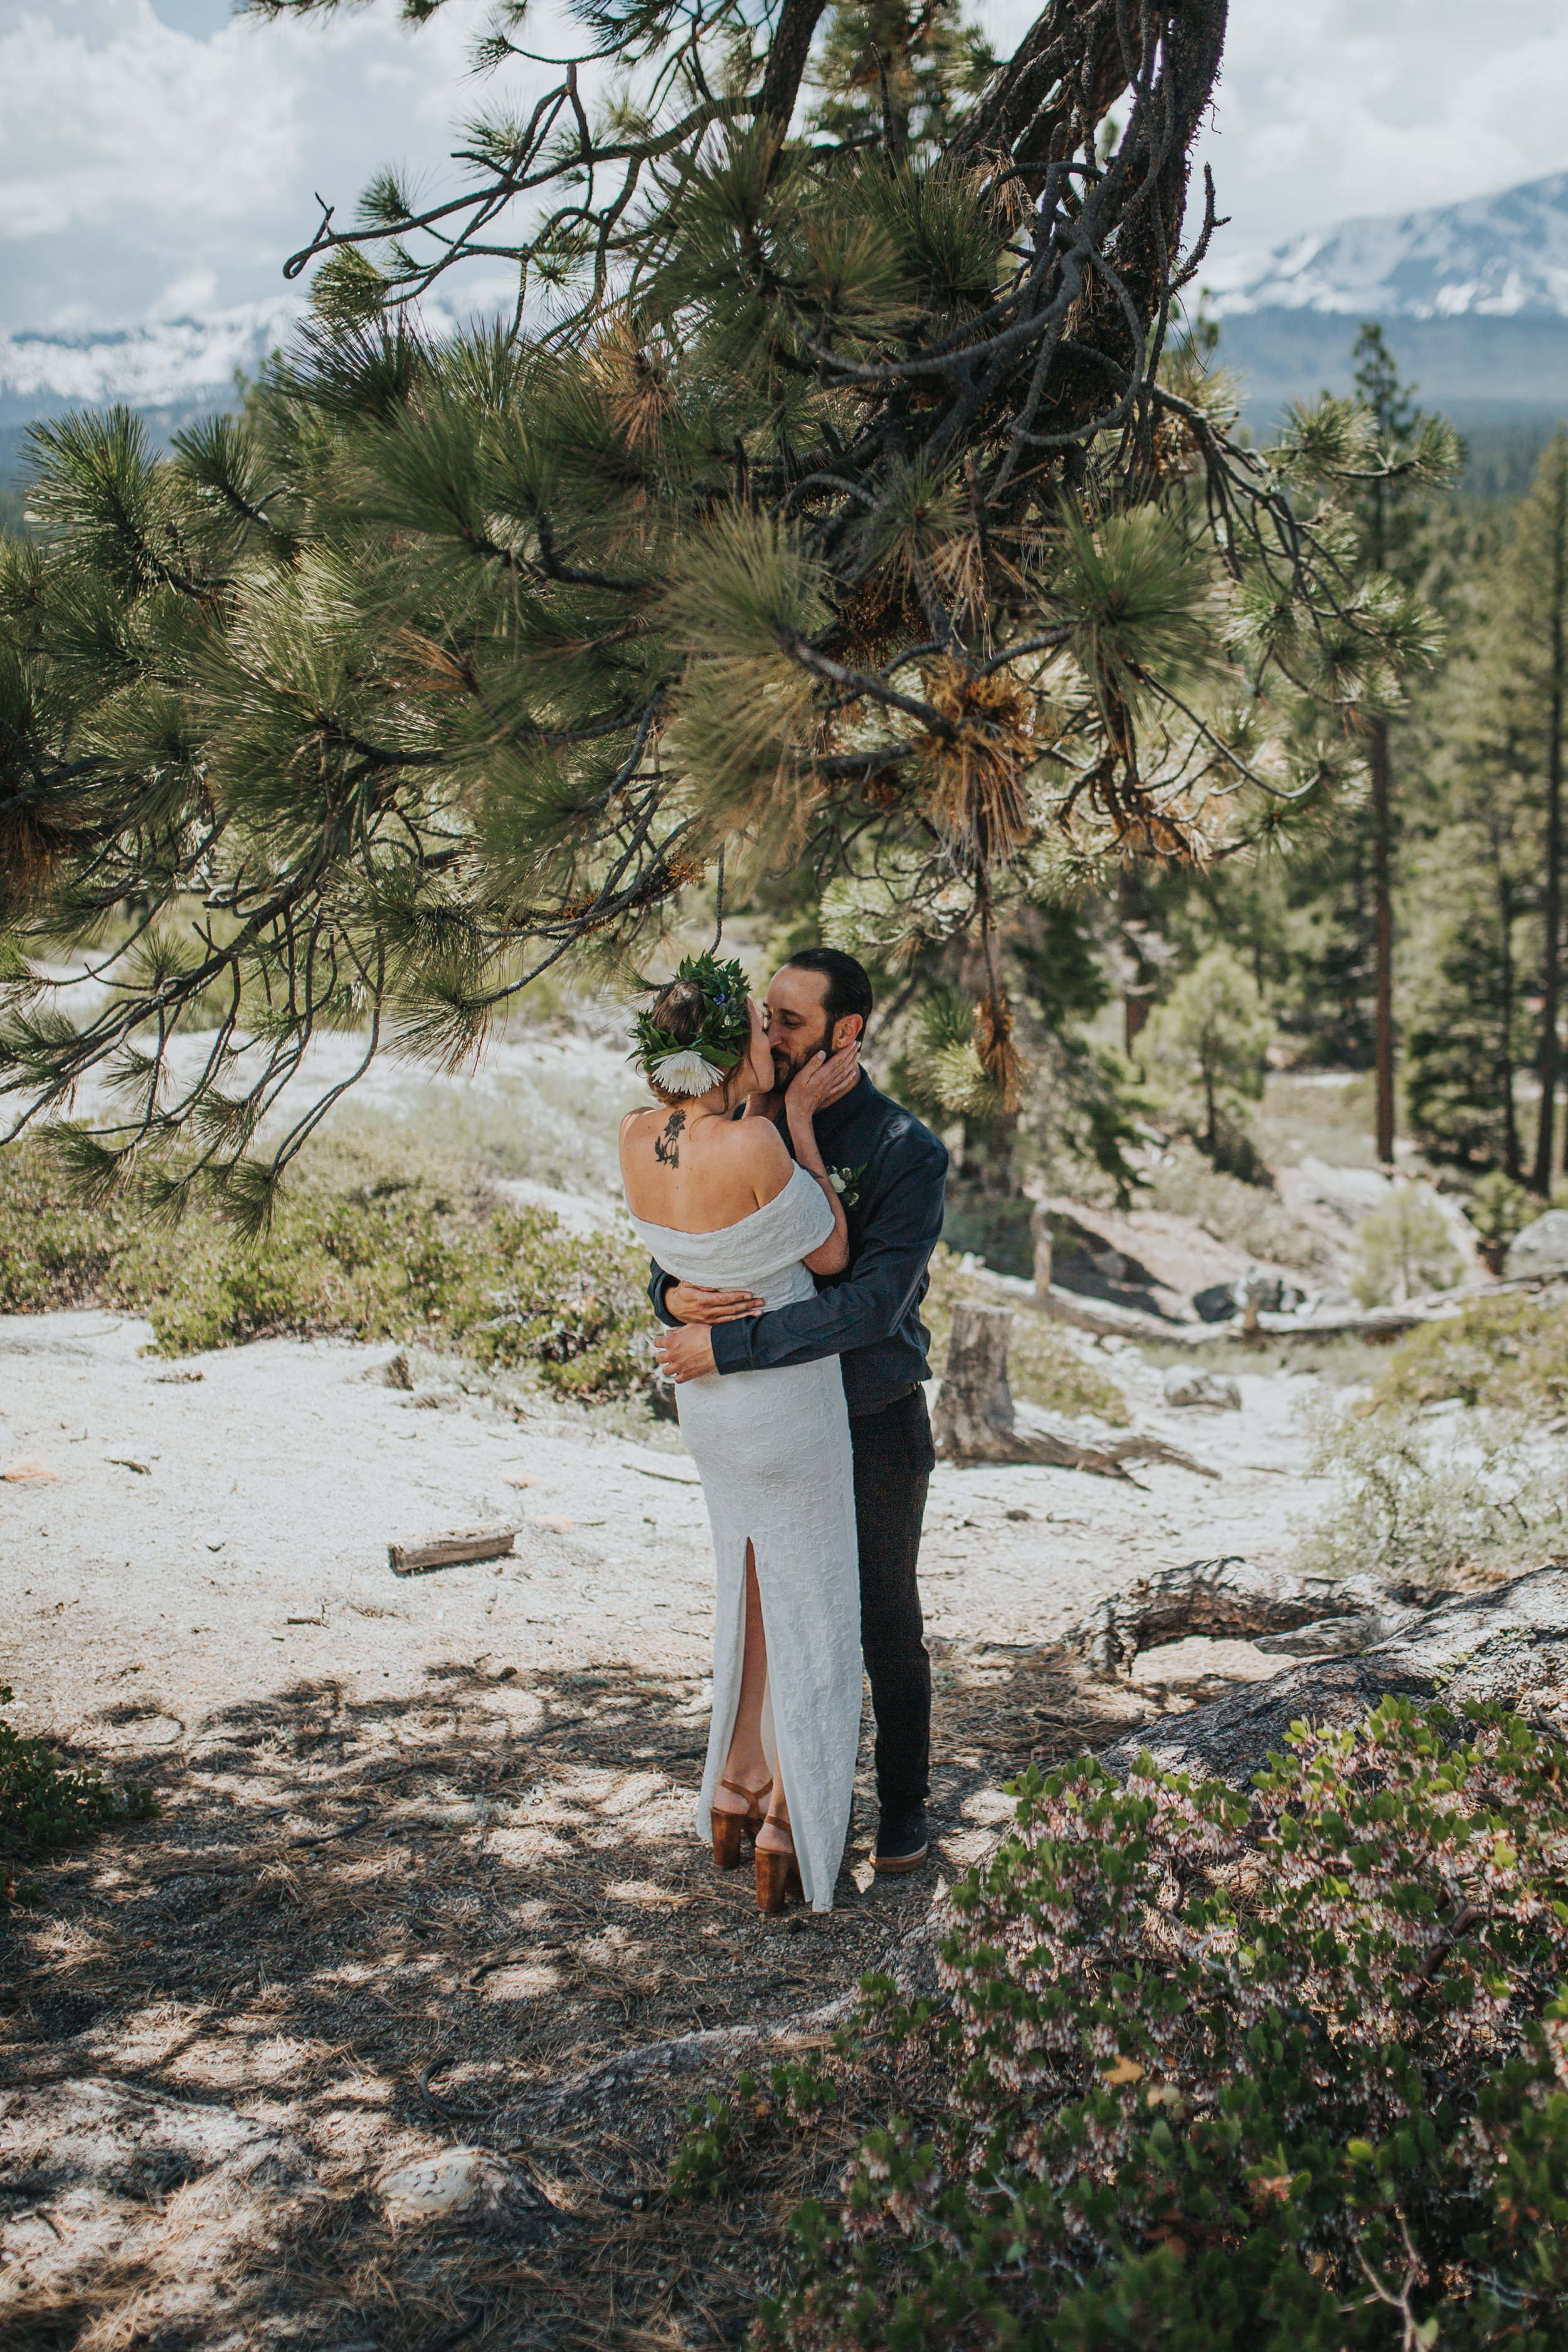 south-lake-tahoe-elopement-valerie-lendvay-photo-011.jpg